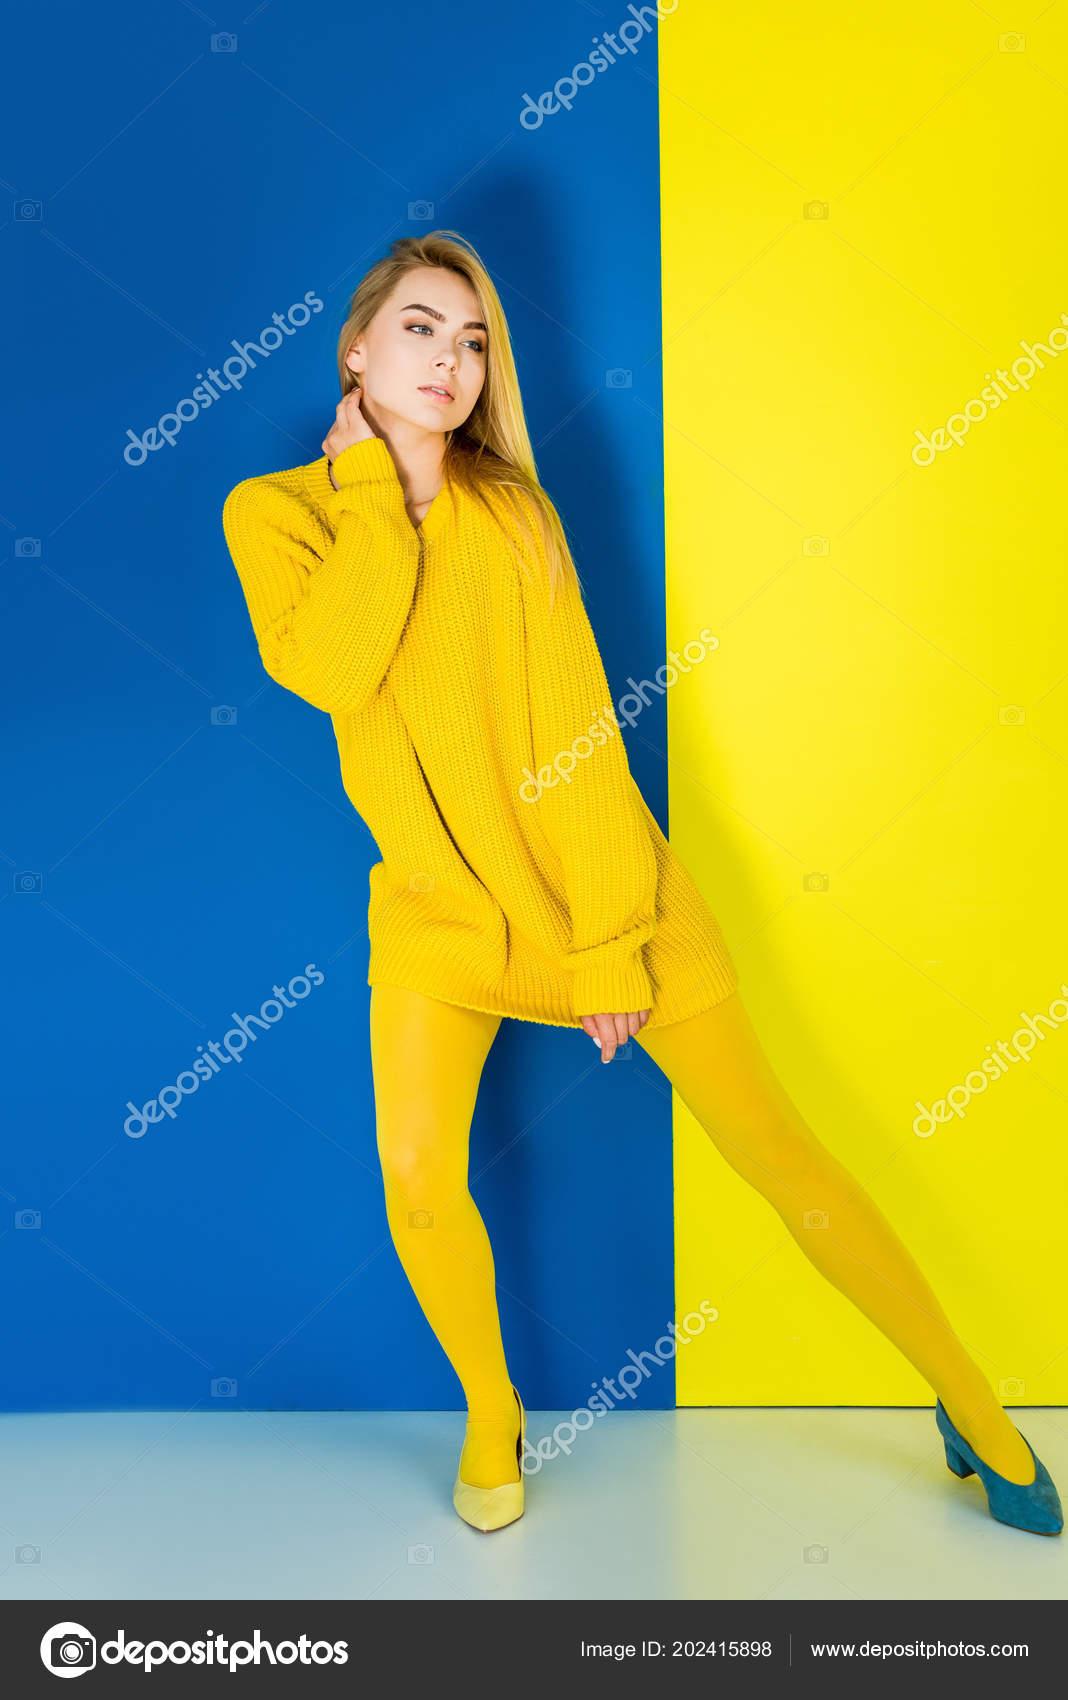 42071d3779a9 Γυναικεία Μόδα Μοντέλο Κίτρινα Ρούχα Και Ένα Μπλε Παπούτσι Μπλε– εικόνα  αρχείου